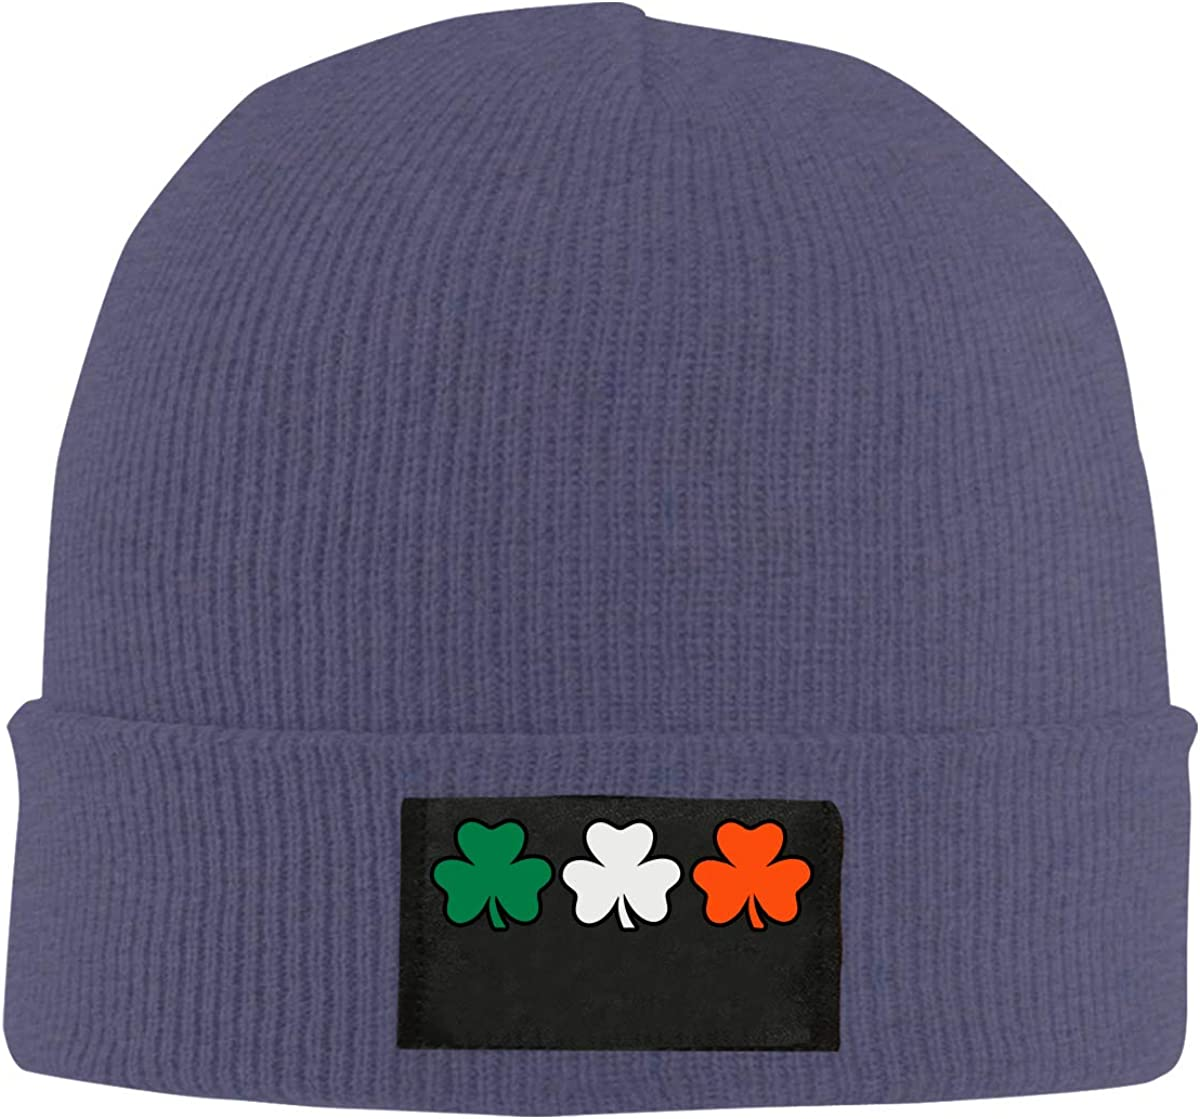 100/% Acrylic Stretch Beanies Cap BF5Y6z/&MA Mens and Womens Ireland Flag Shamrocks Knitted Cap